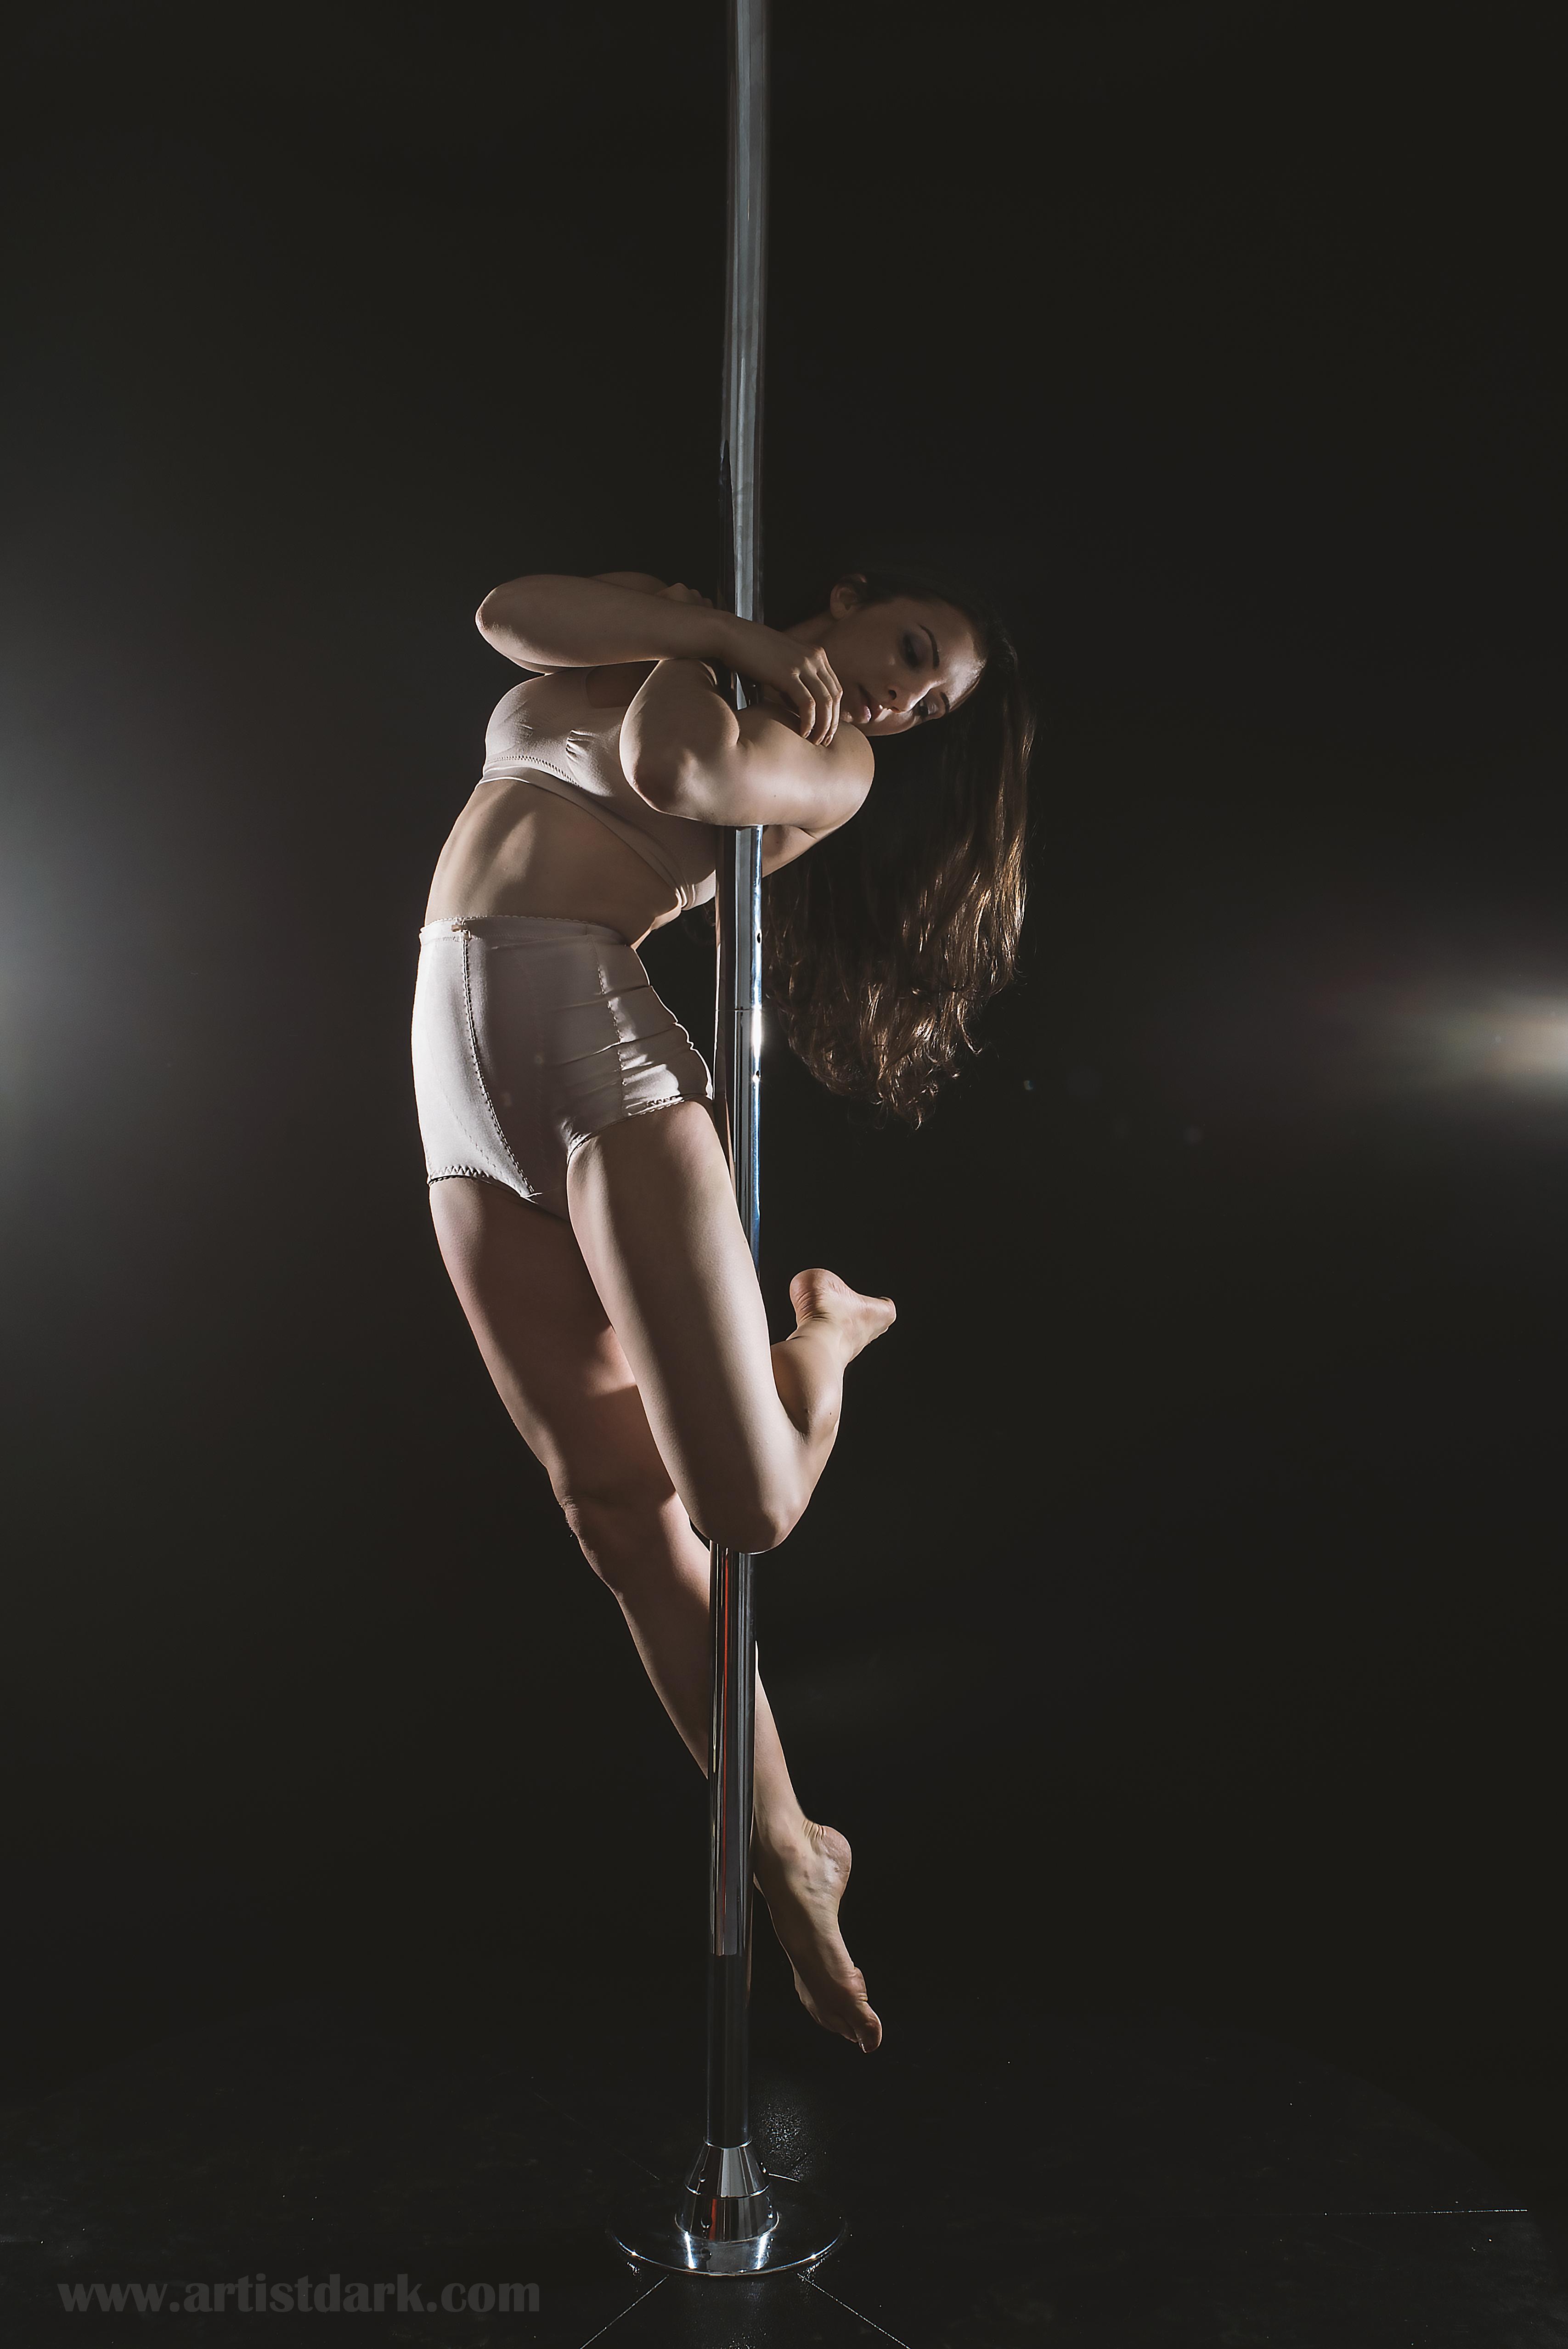 Armpit hang